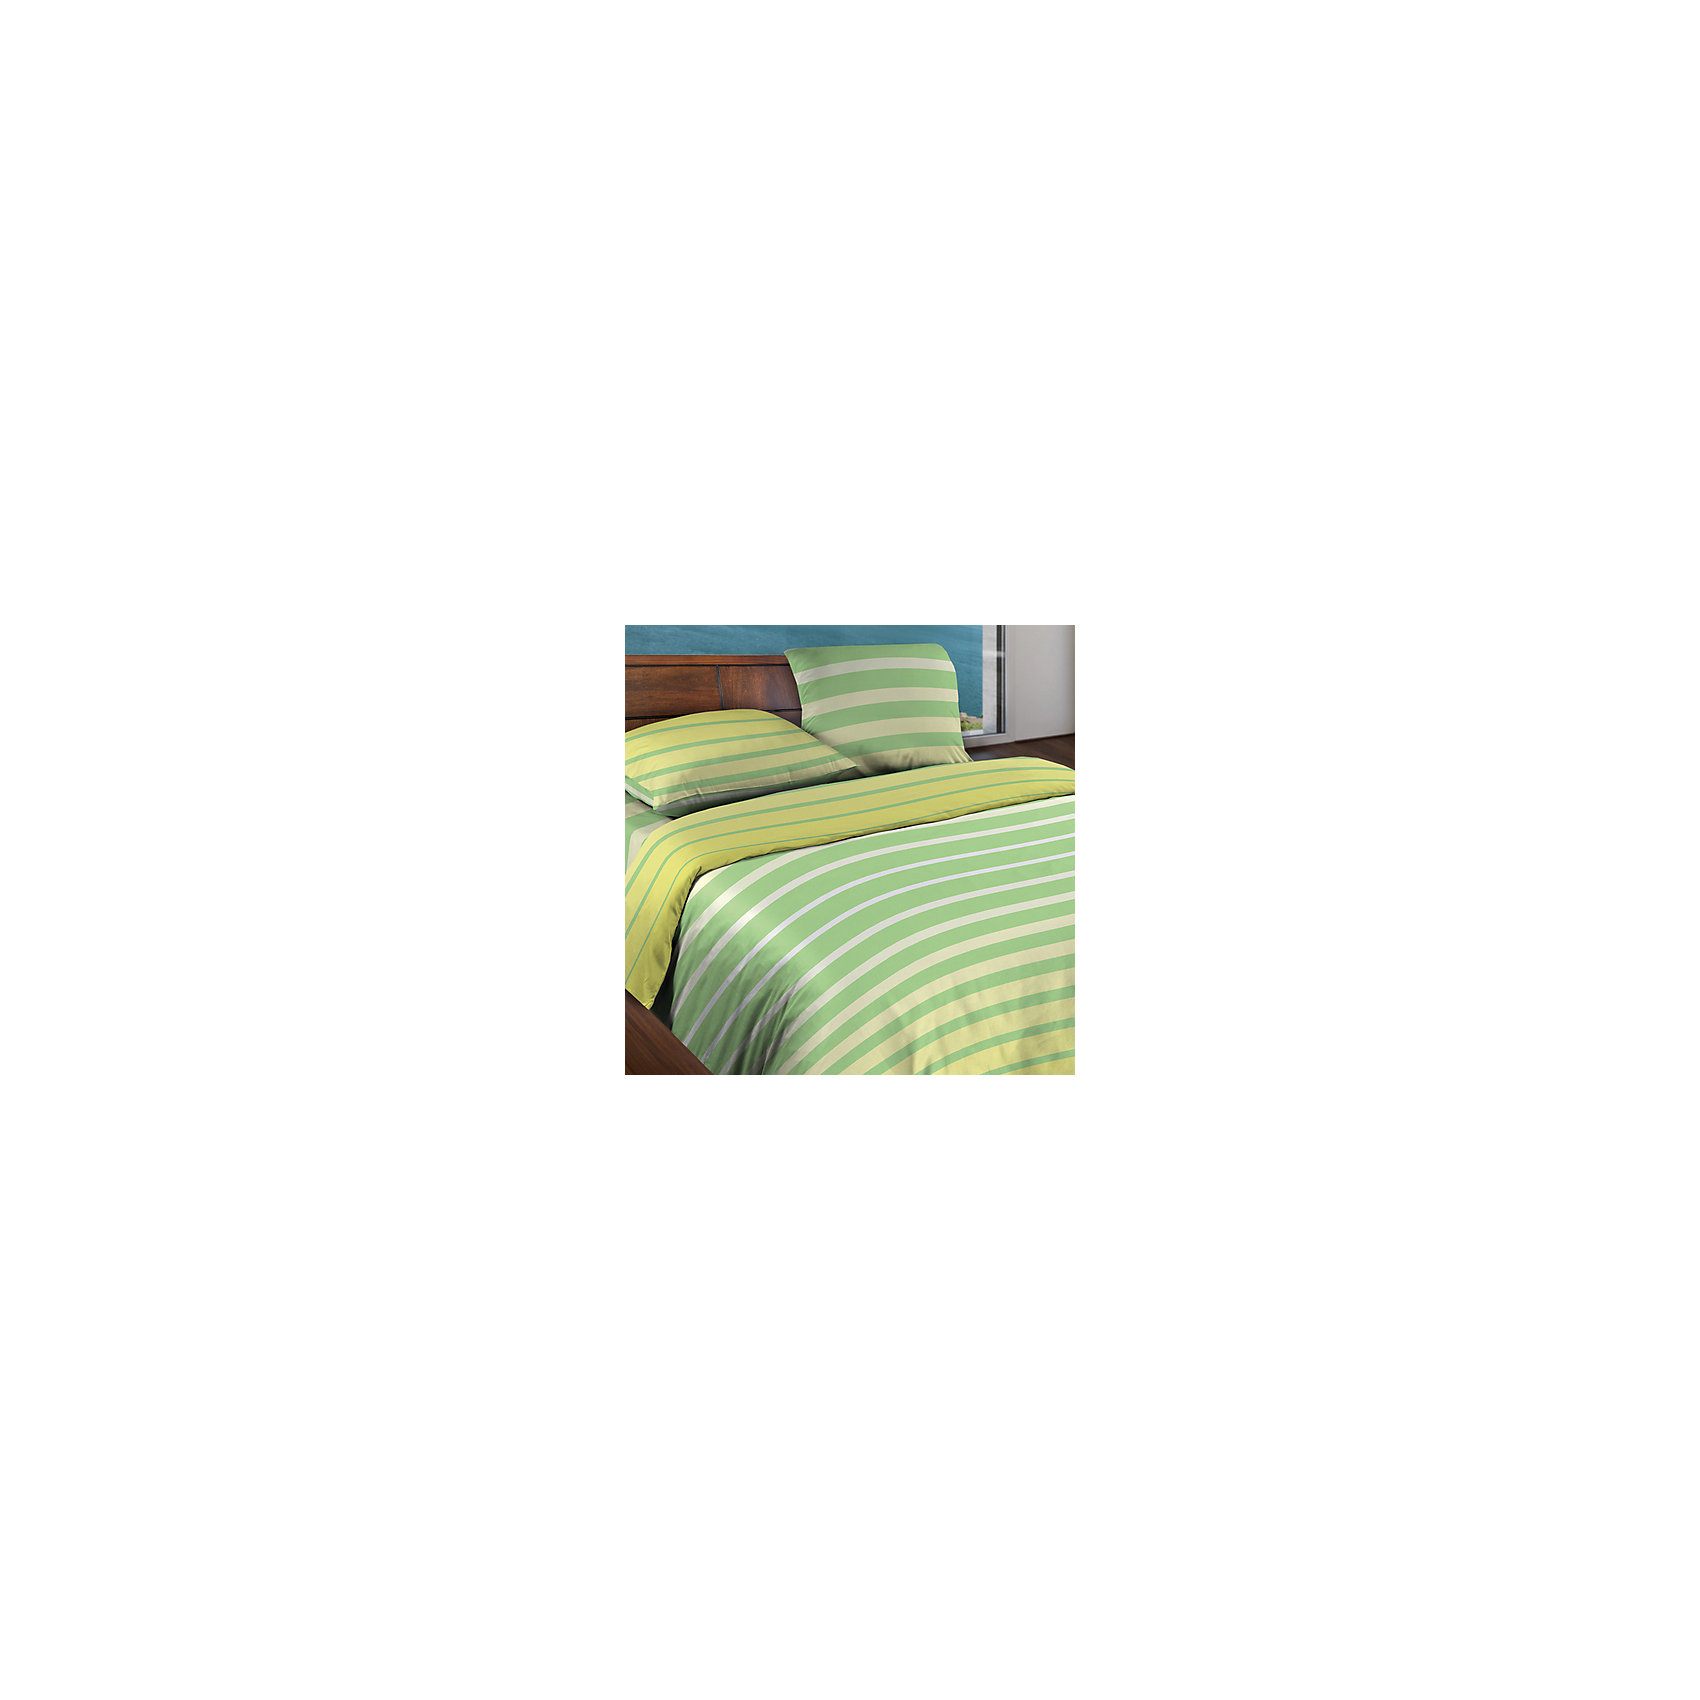 Wenge Постельное белье 2,0 сп. Stripe Lime БИО Комфорт, Wenge Motion